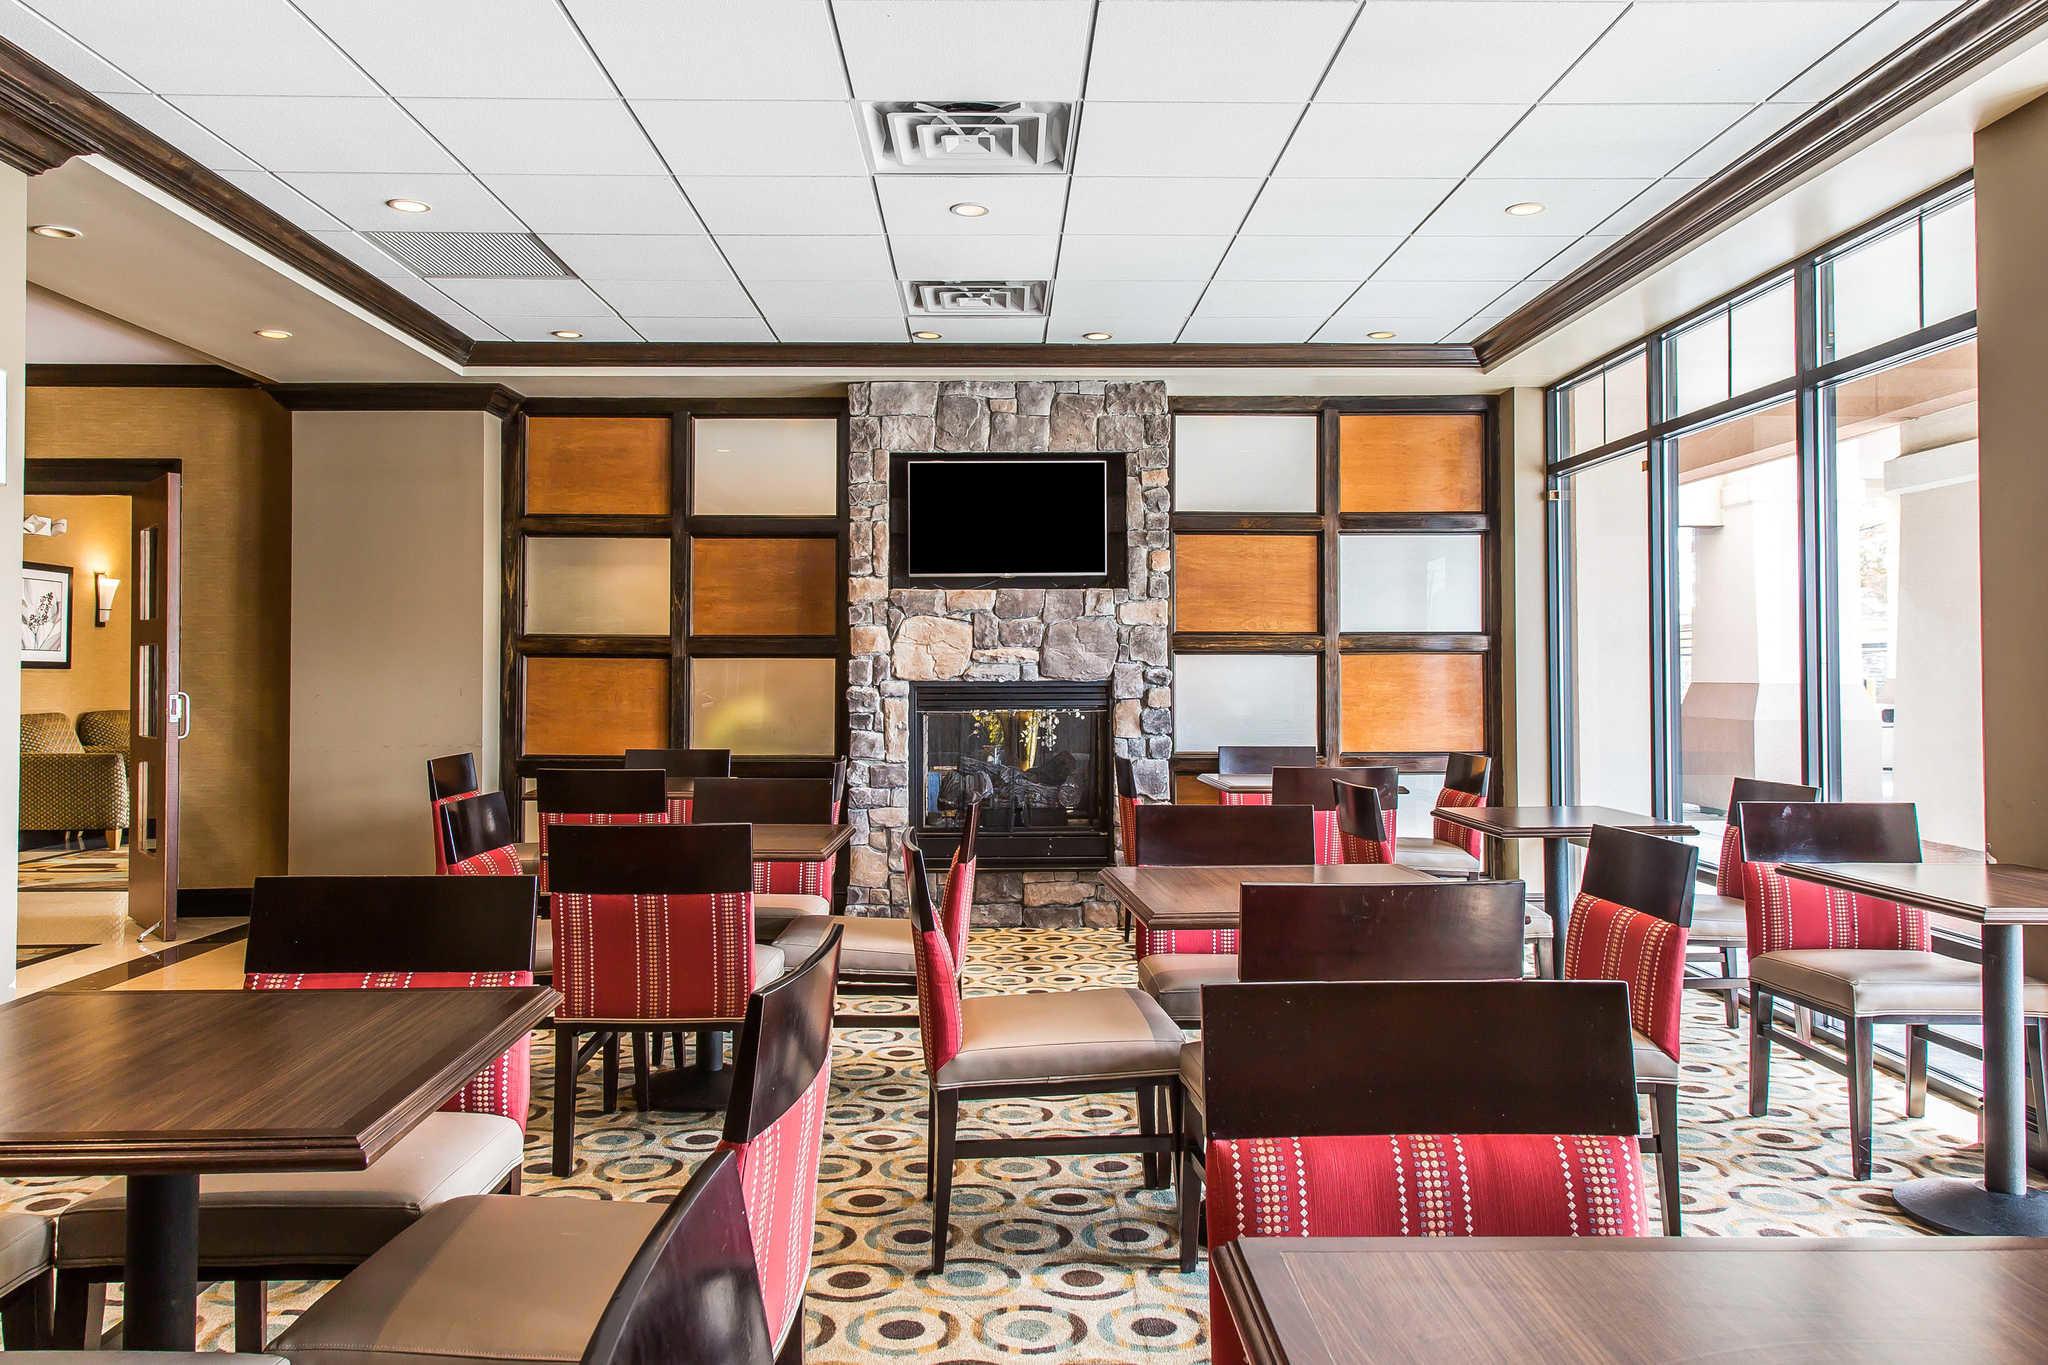 Comfort Inn & Suites image 32